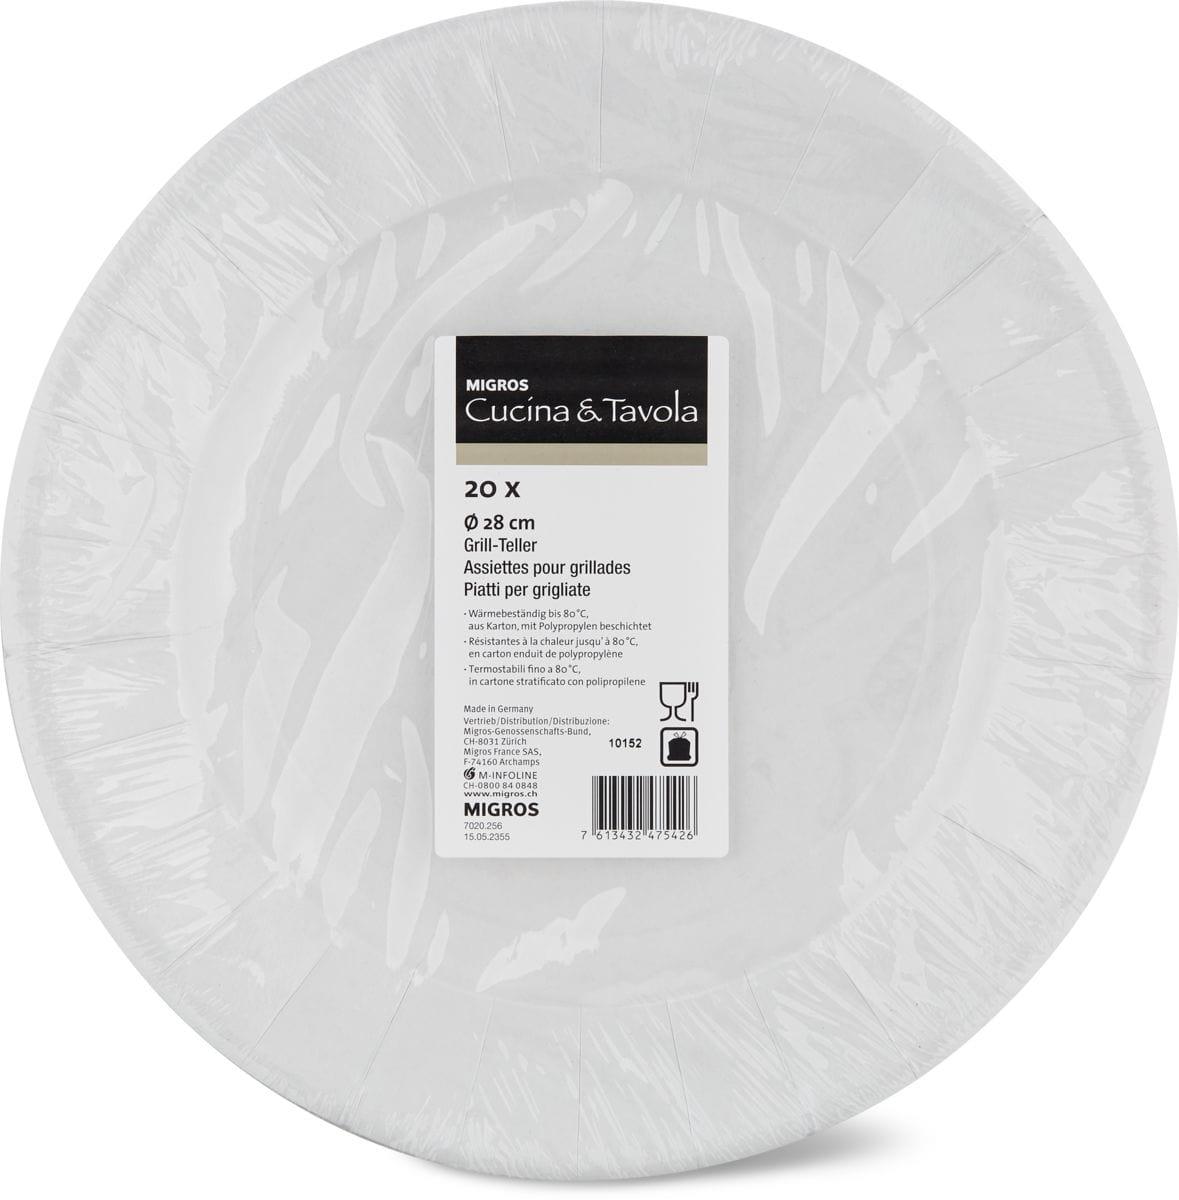 Cucina & Tavola Grill-Teller, 20 Stück